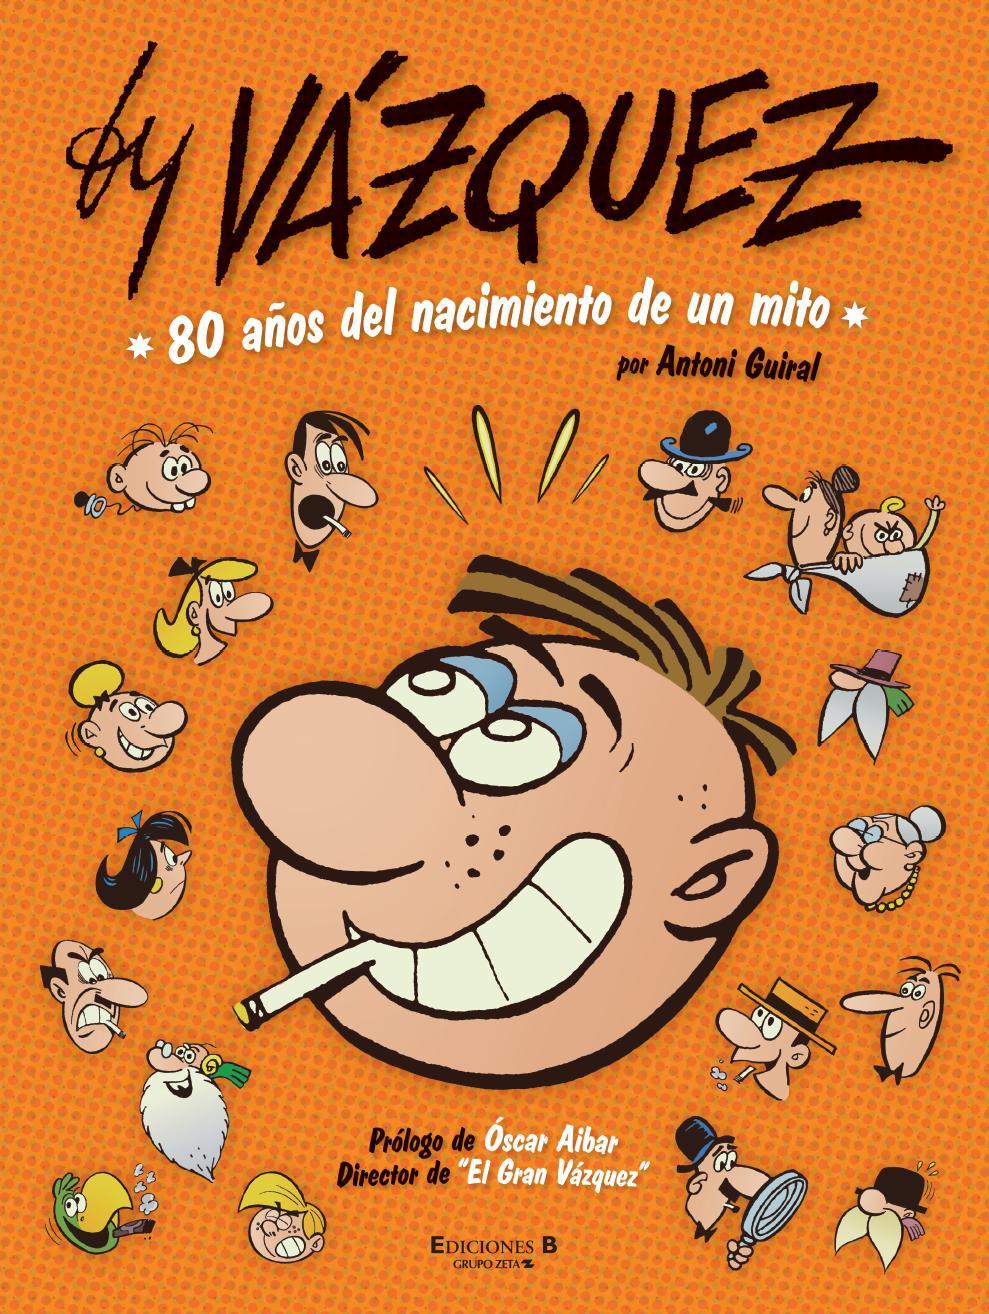 Personaje de comic Byvazquezok